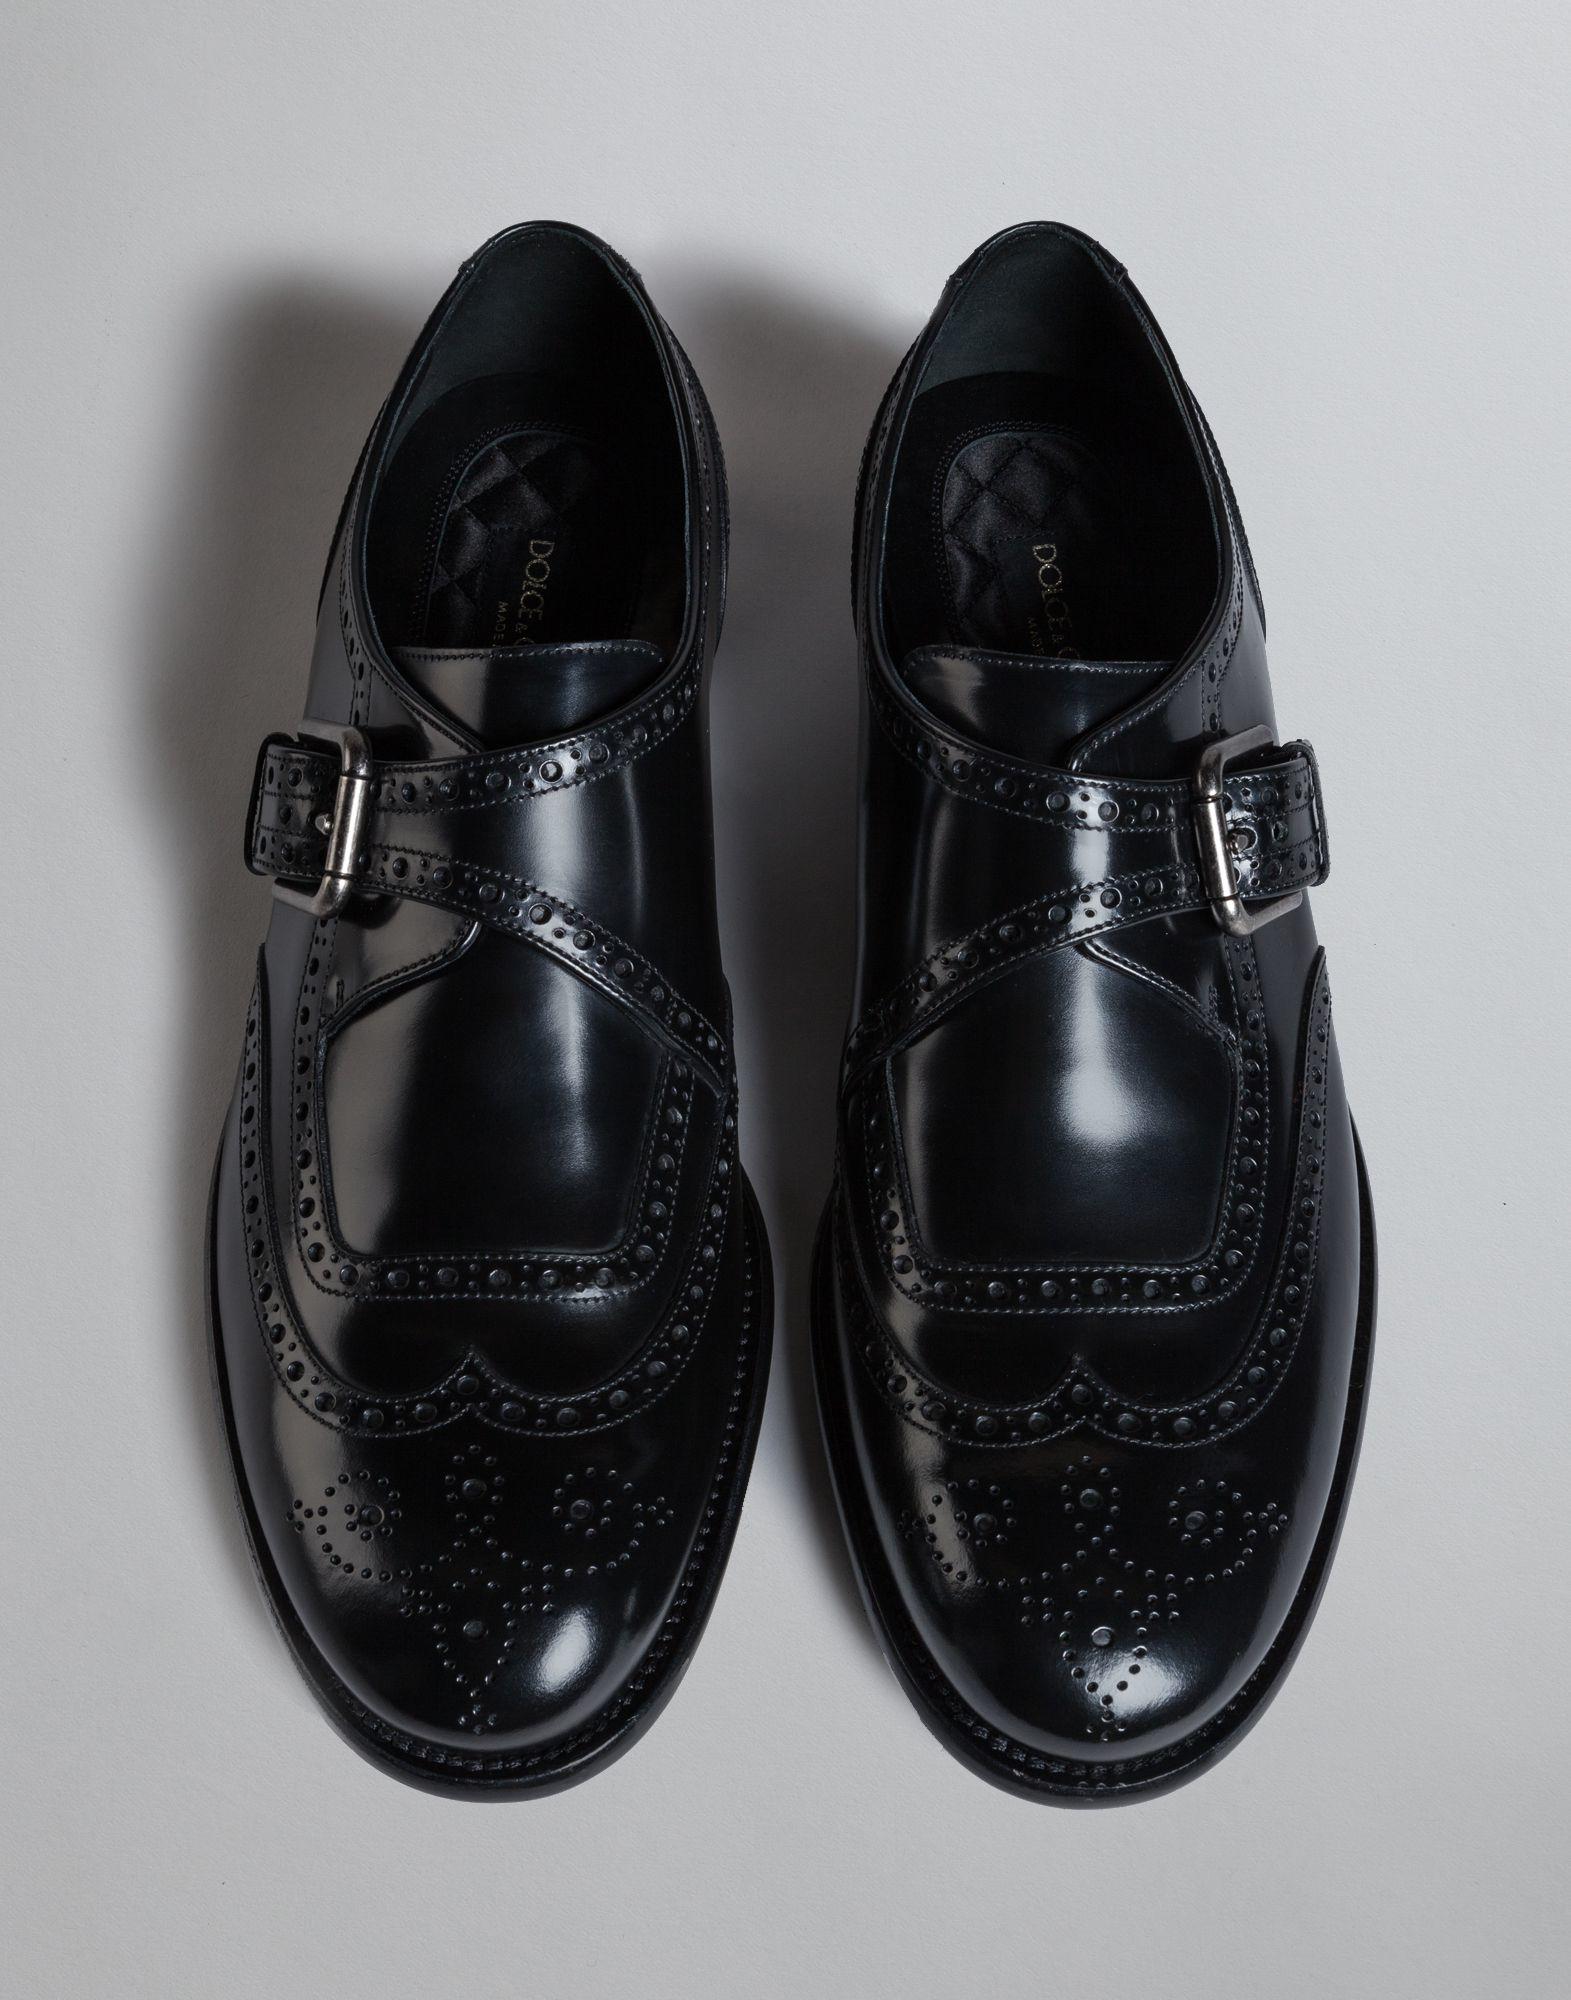 monk strap shoes - Black Dolce & Gabbana wpeMDbs8